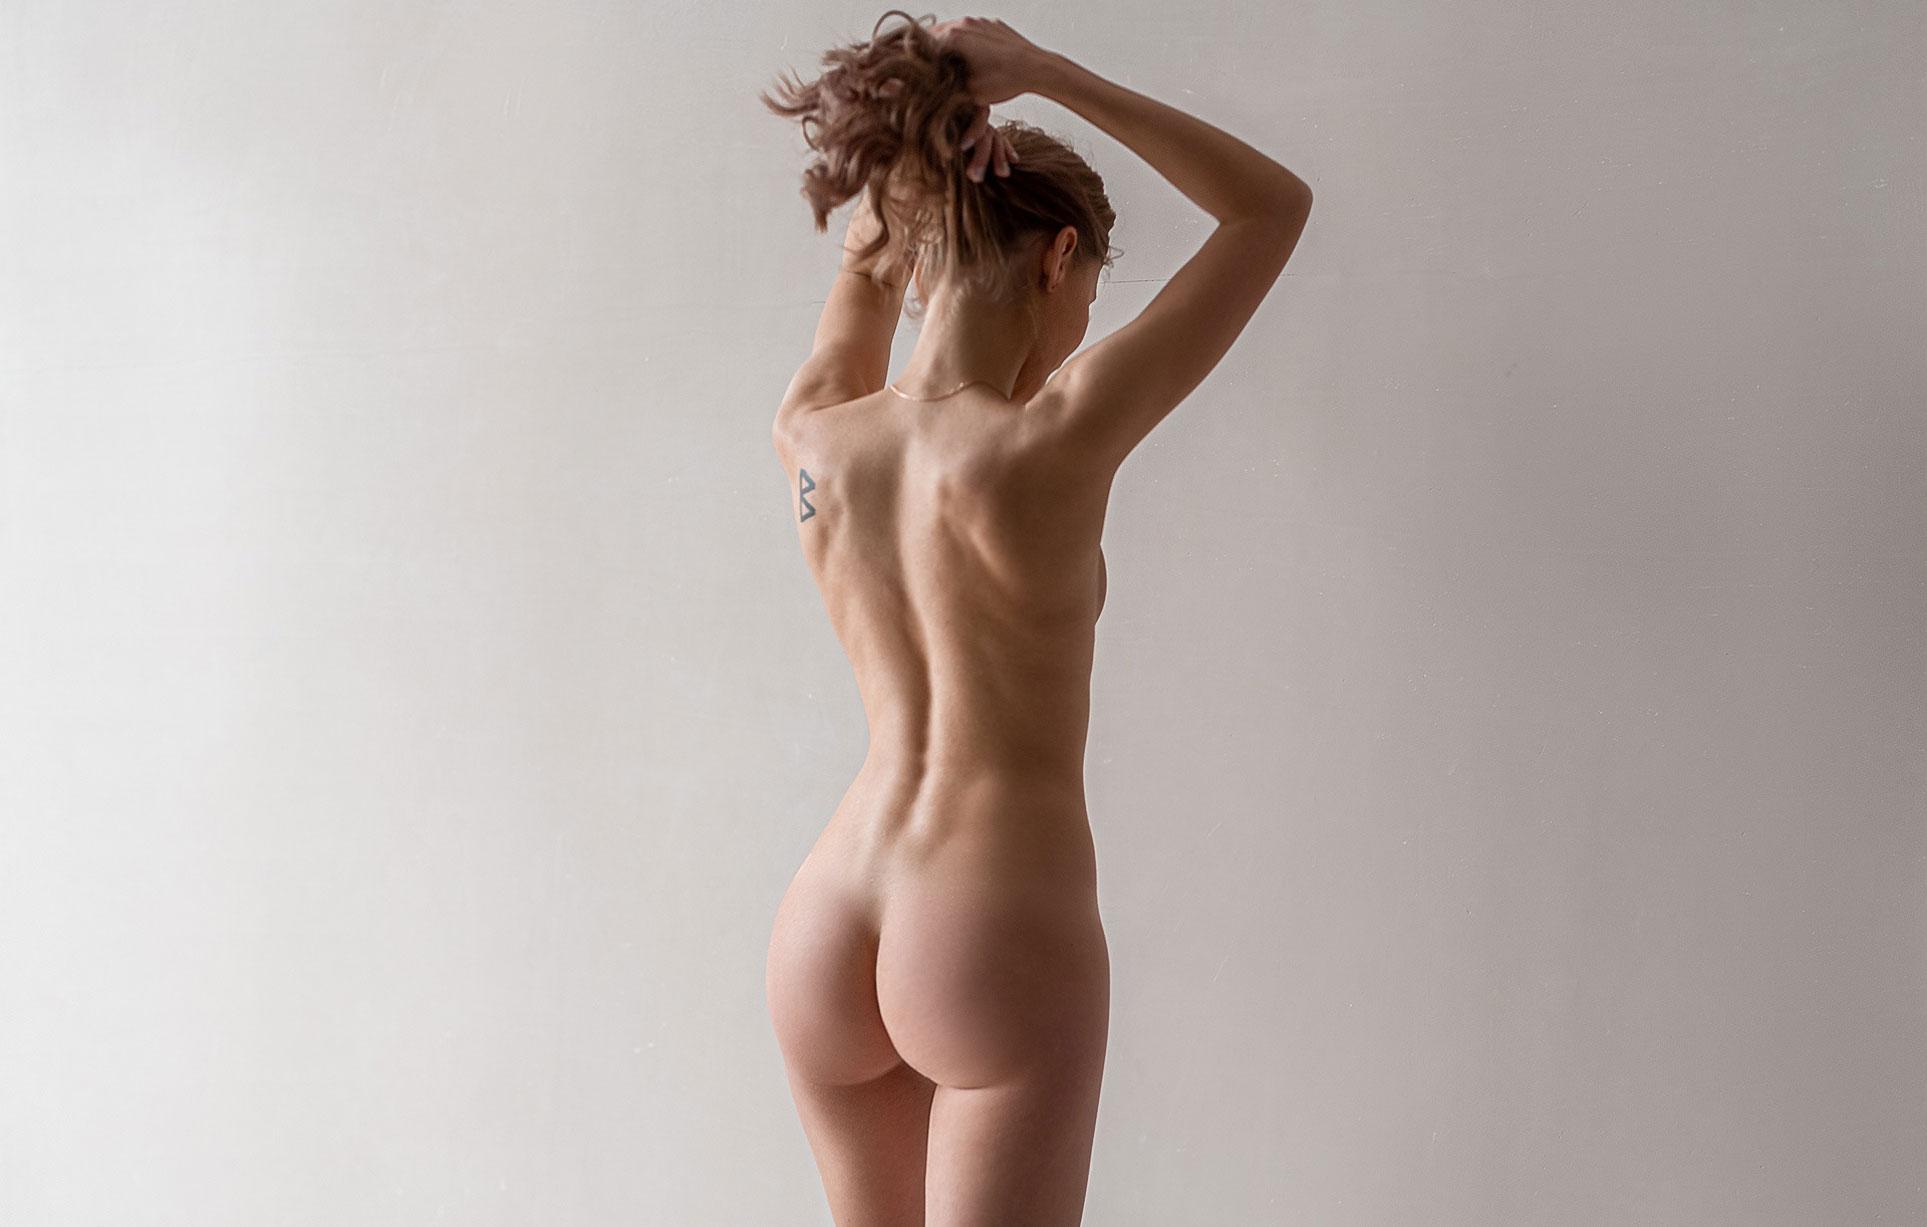 Тэш в сапогах и пальто на голое тело / фото 03